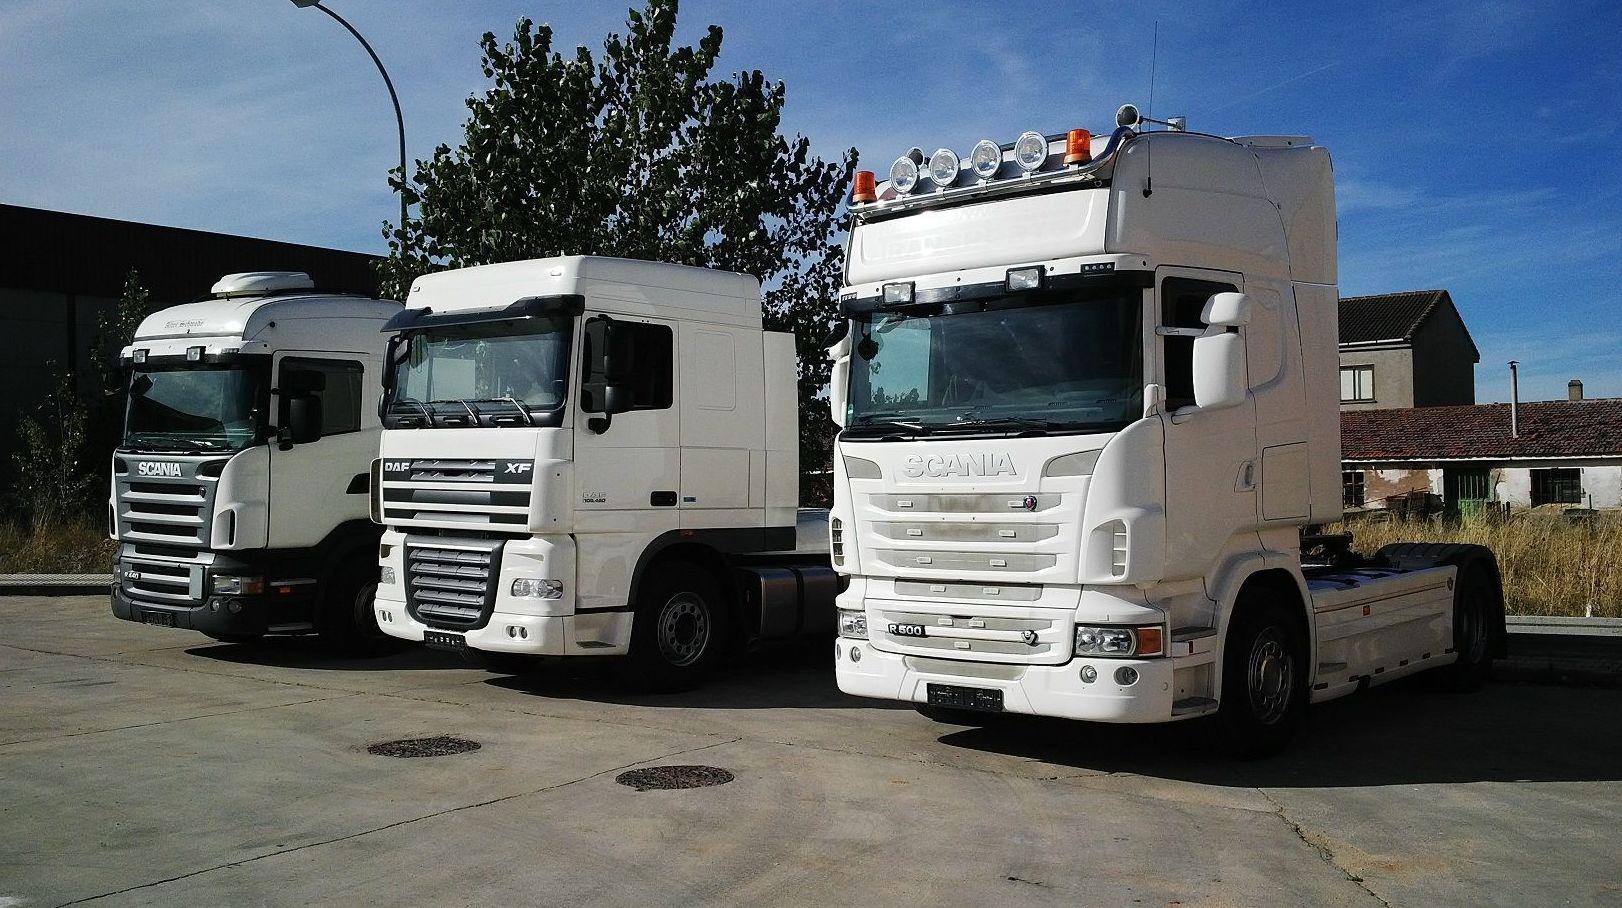 Foto 25 de Camiones en Villares de la Reina | Autotruck Salamanca